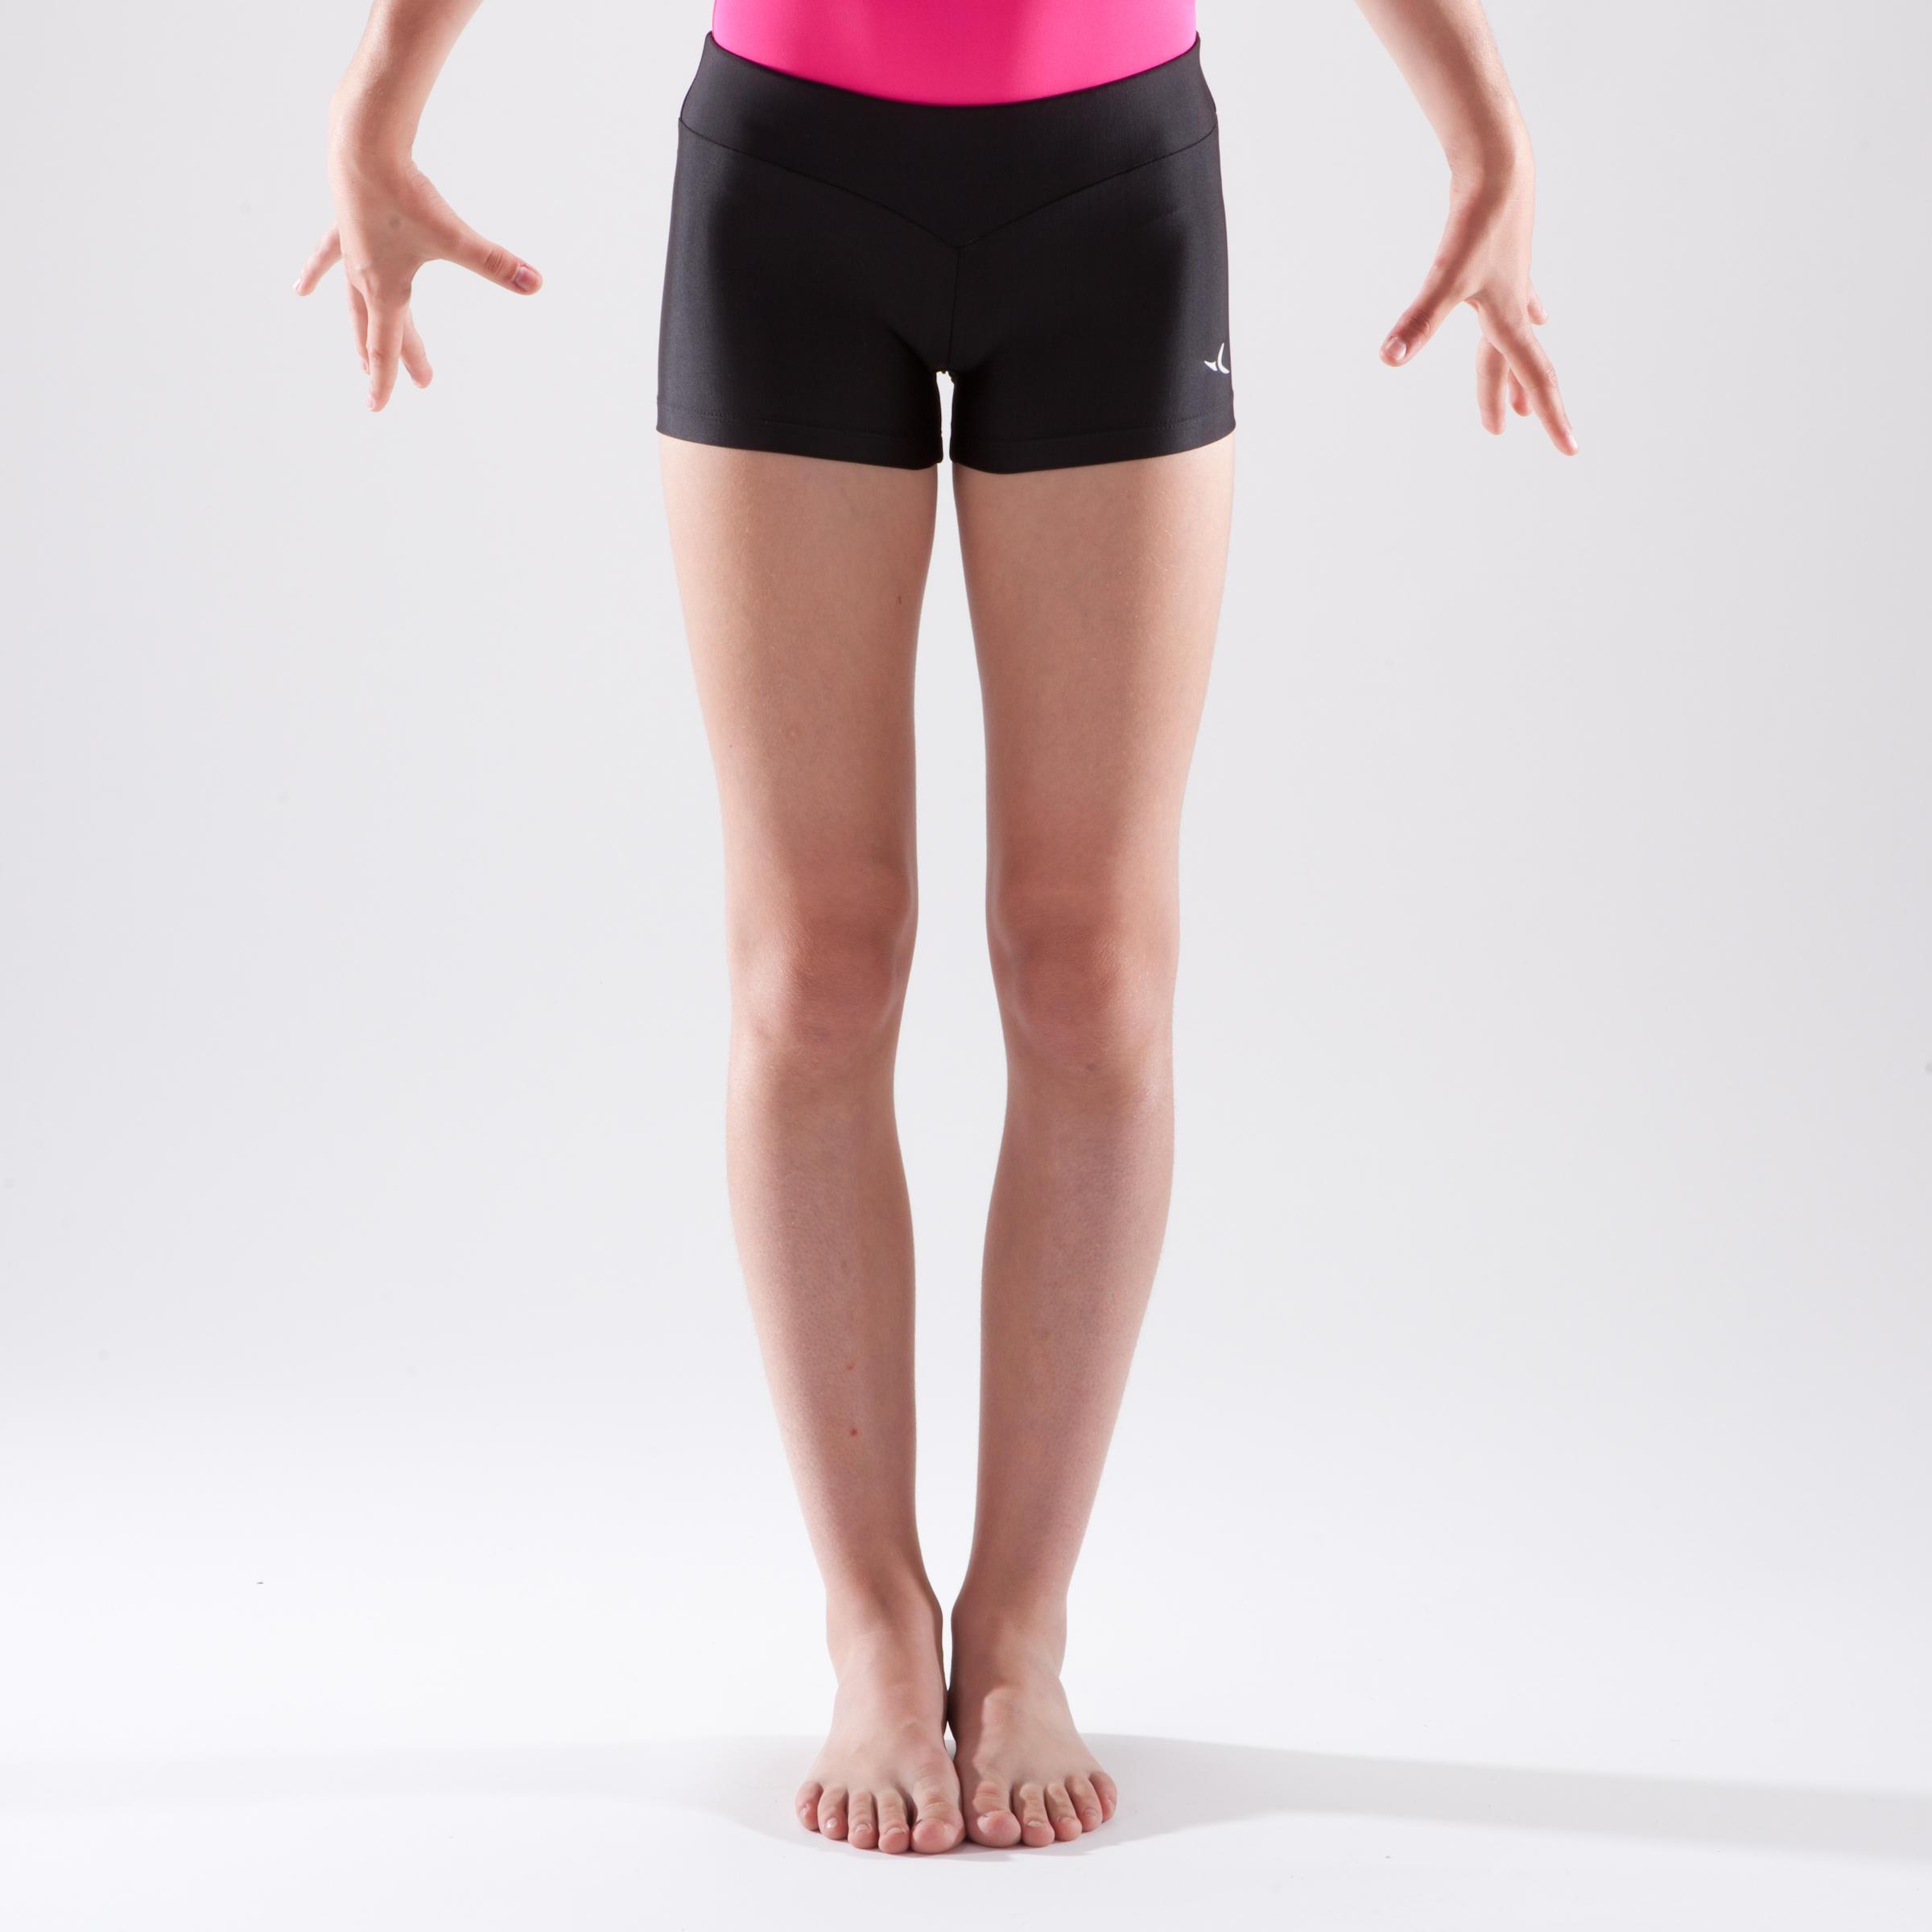 Girls' Artistic Gymnastics Shorts - Black